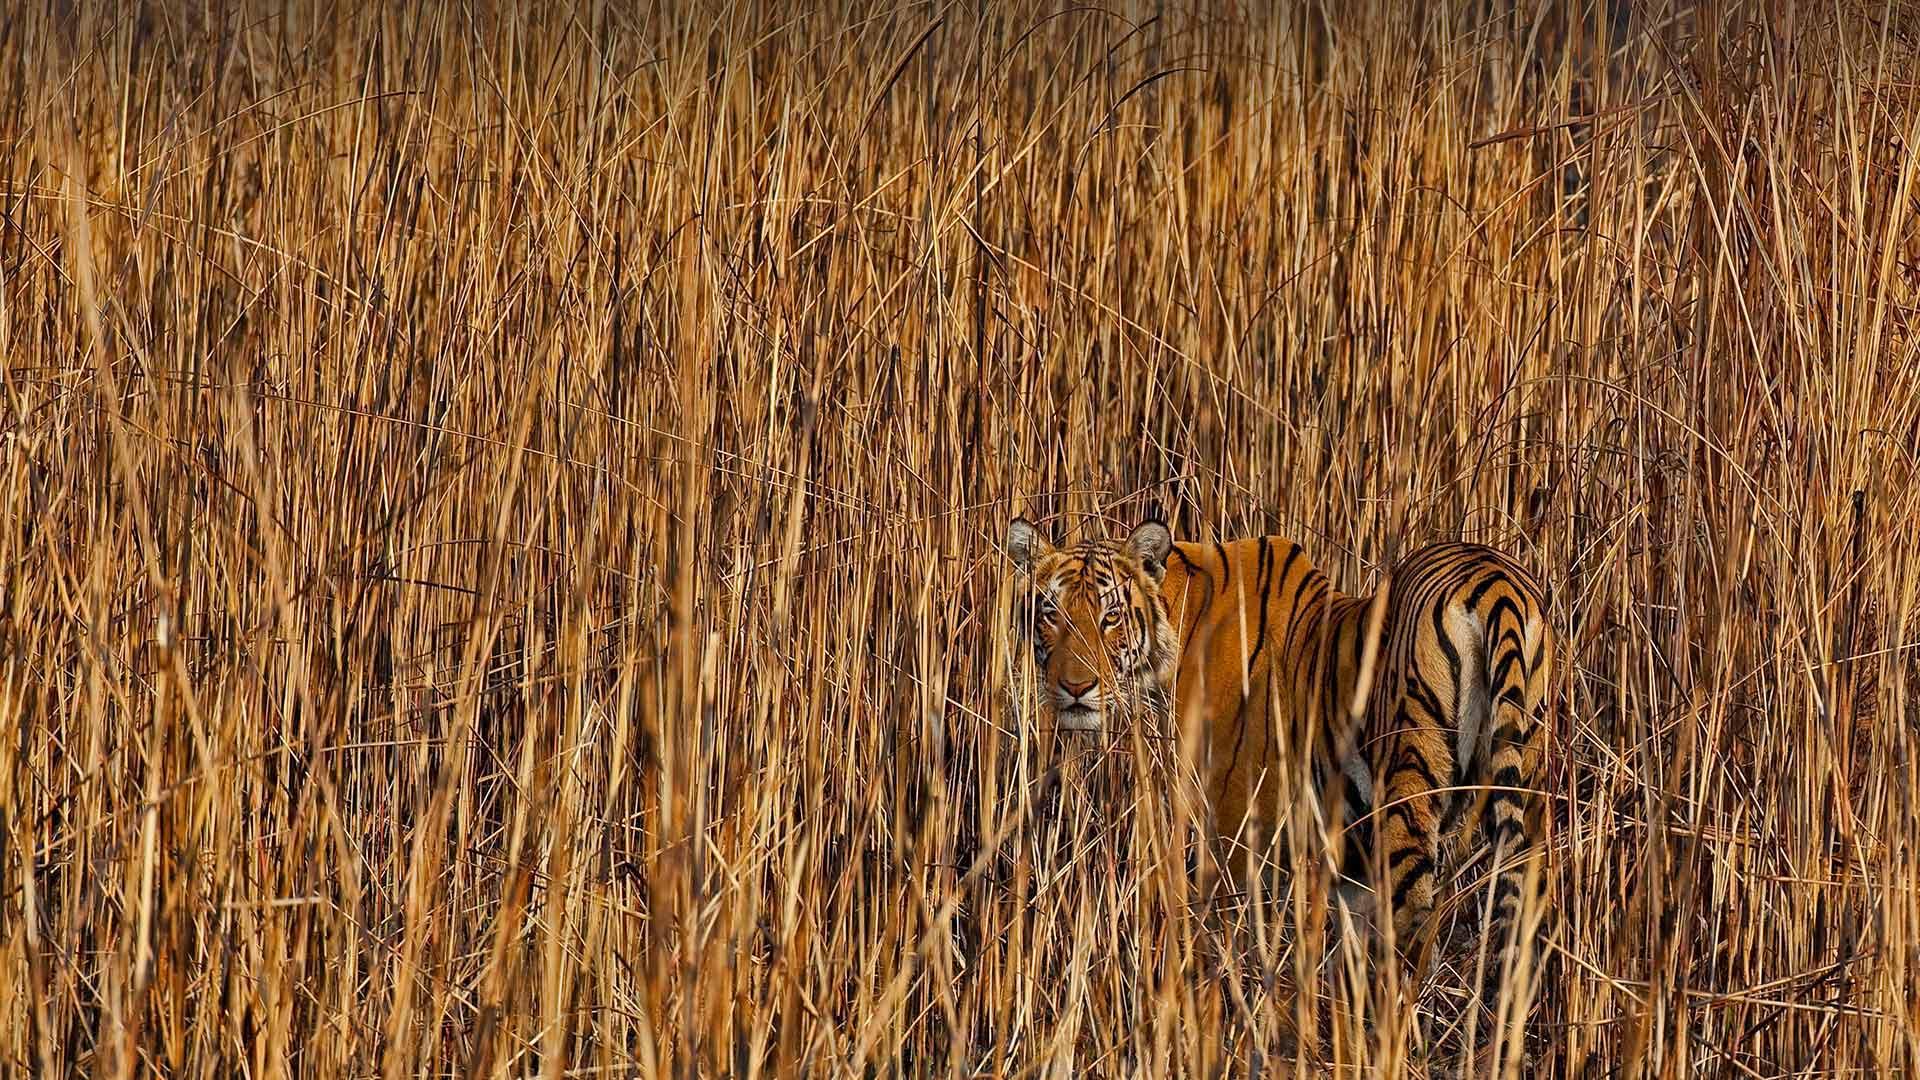 Tiger in Assam, India (? Sandesh Kadur/Minden Pictures)